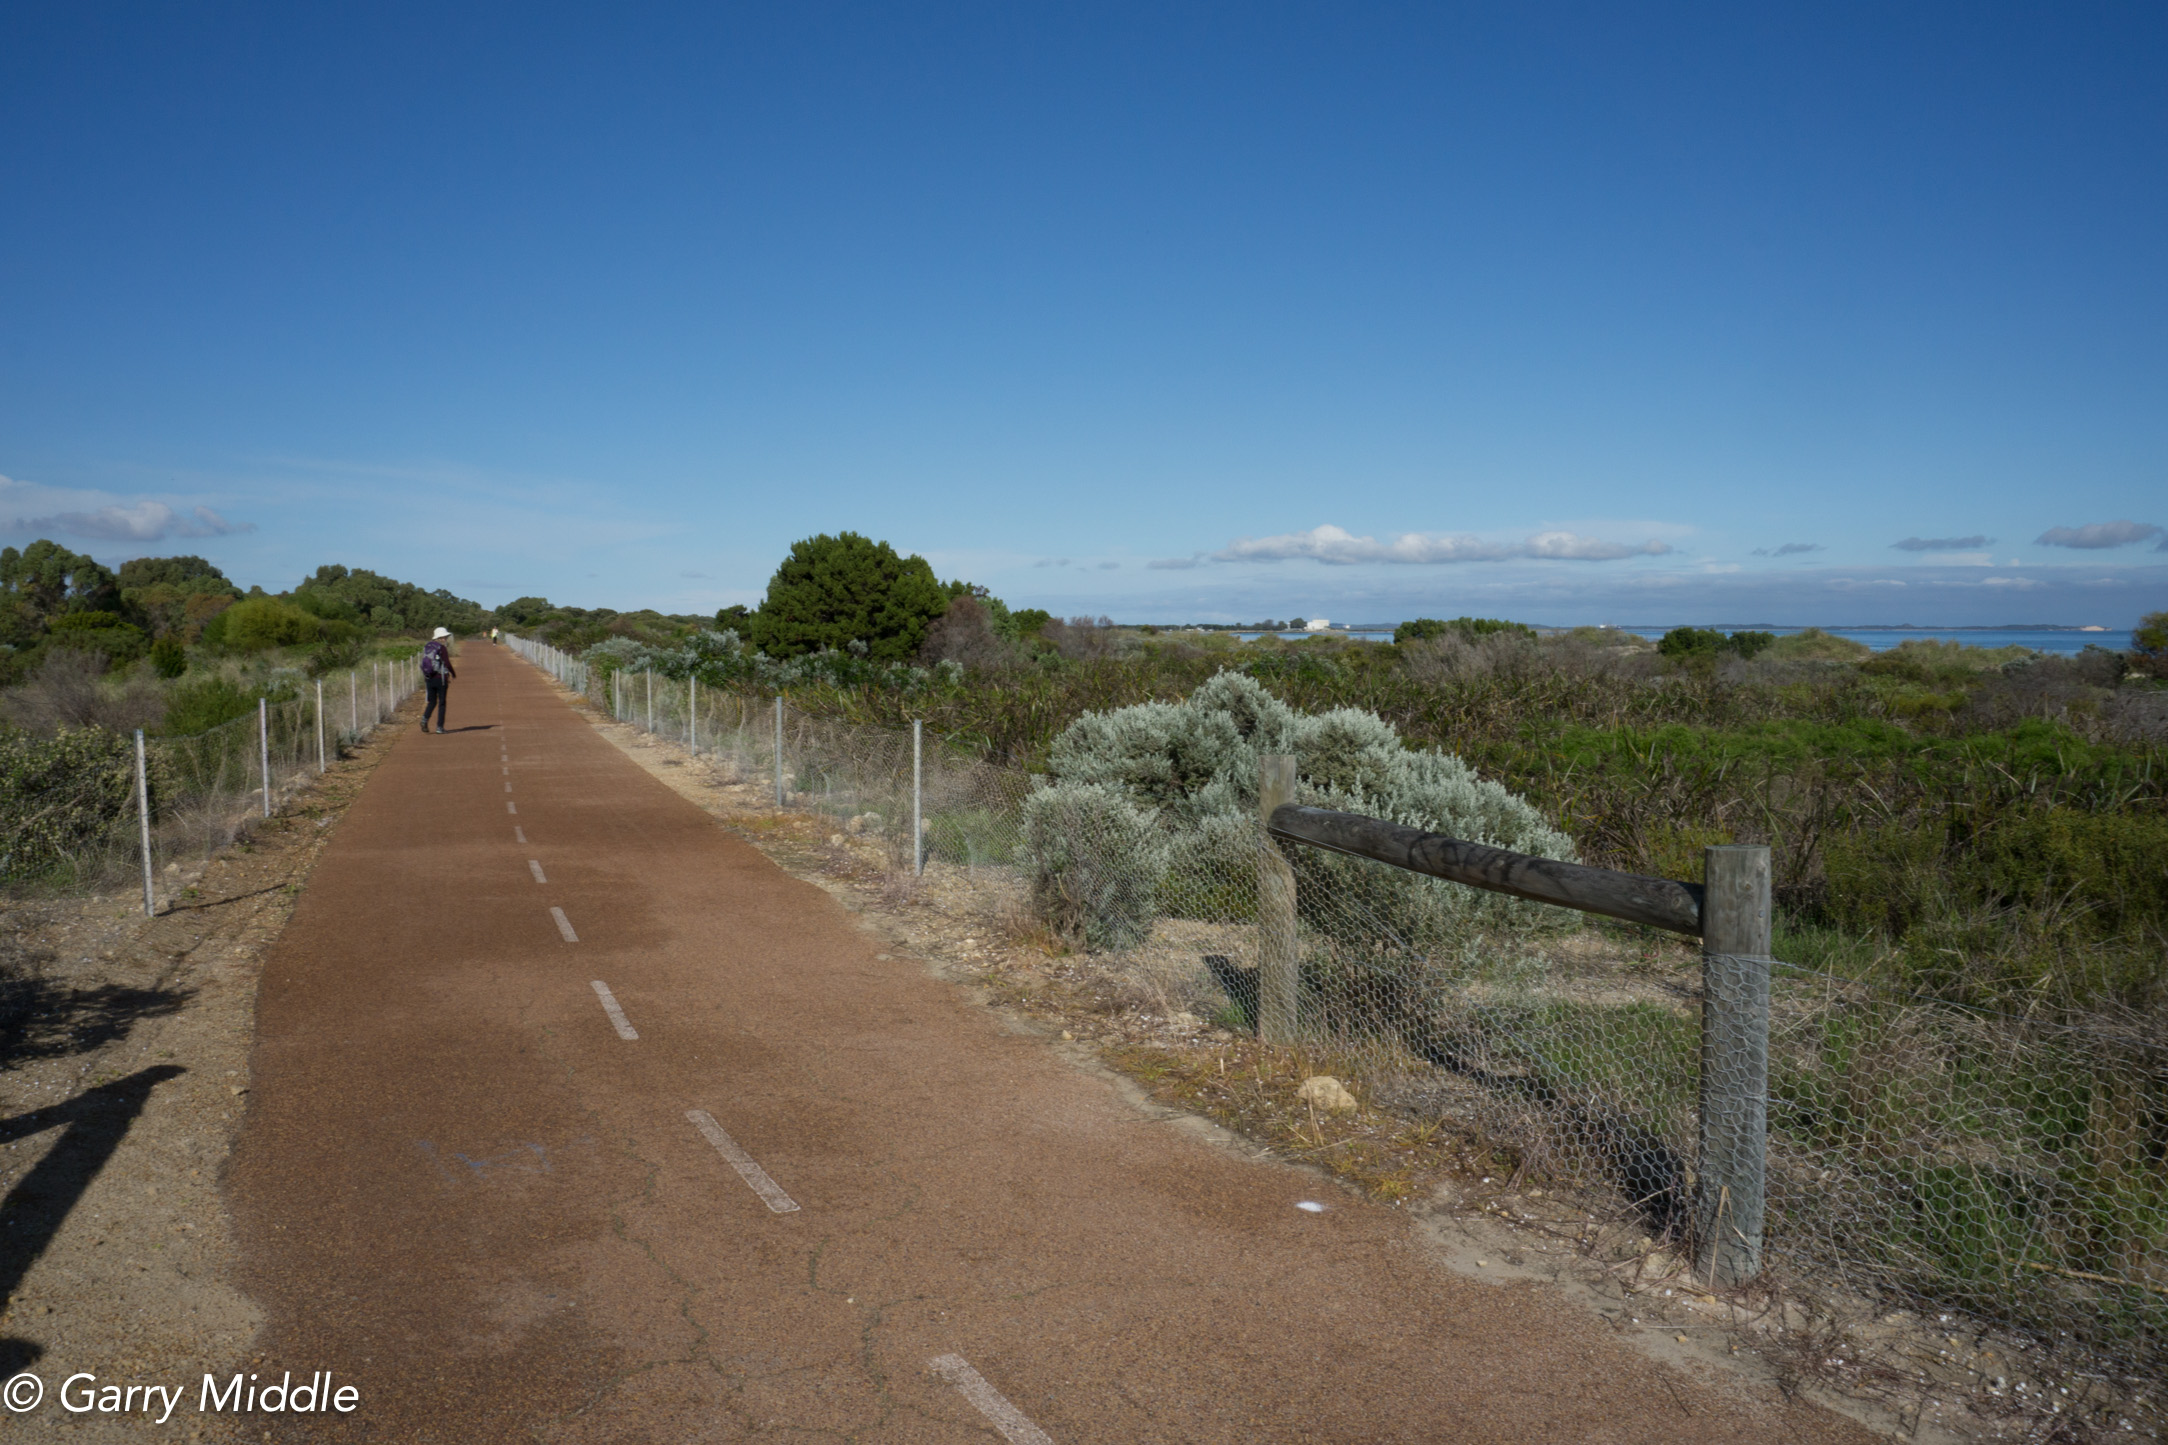 Plate 7: Path through low coastal scrub